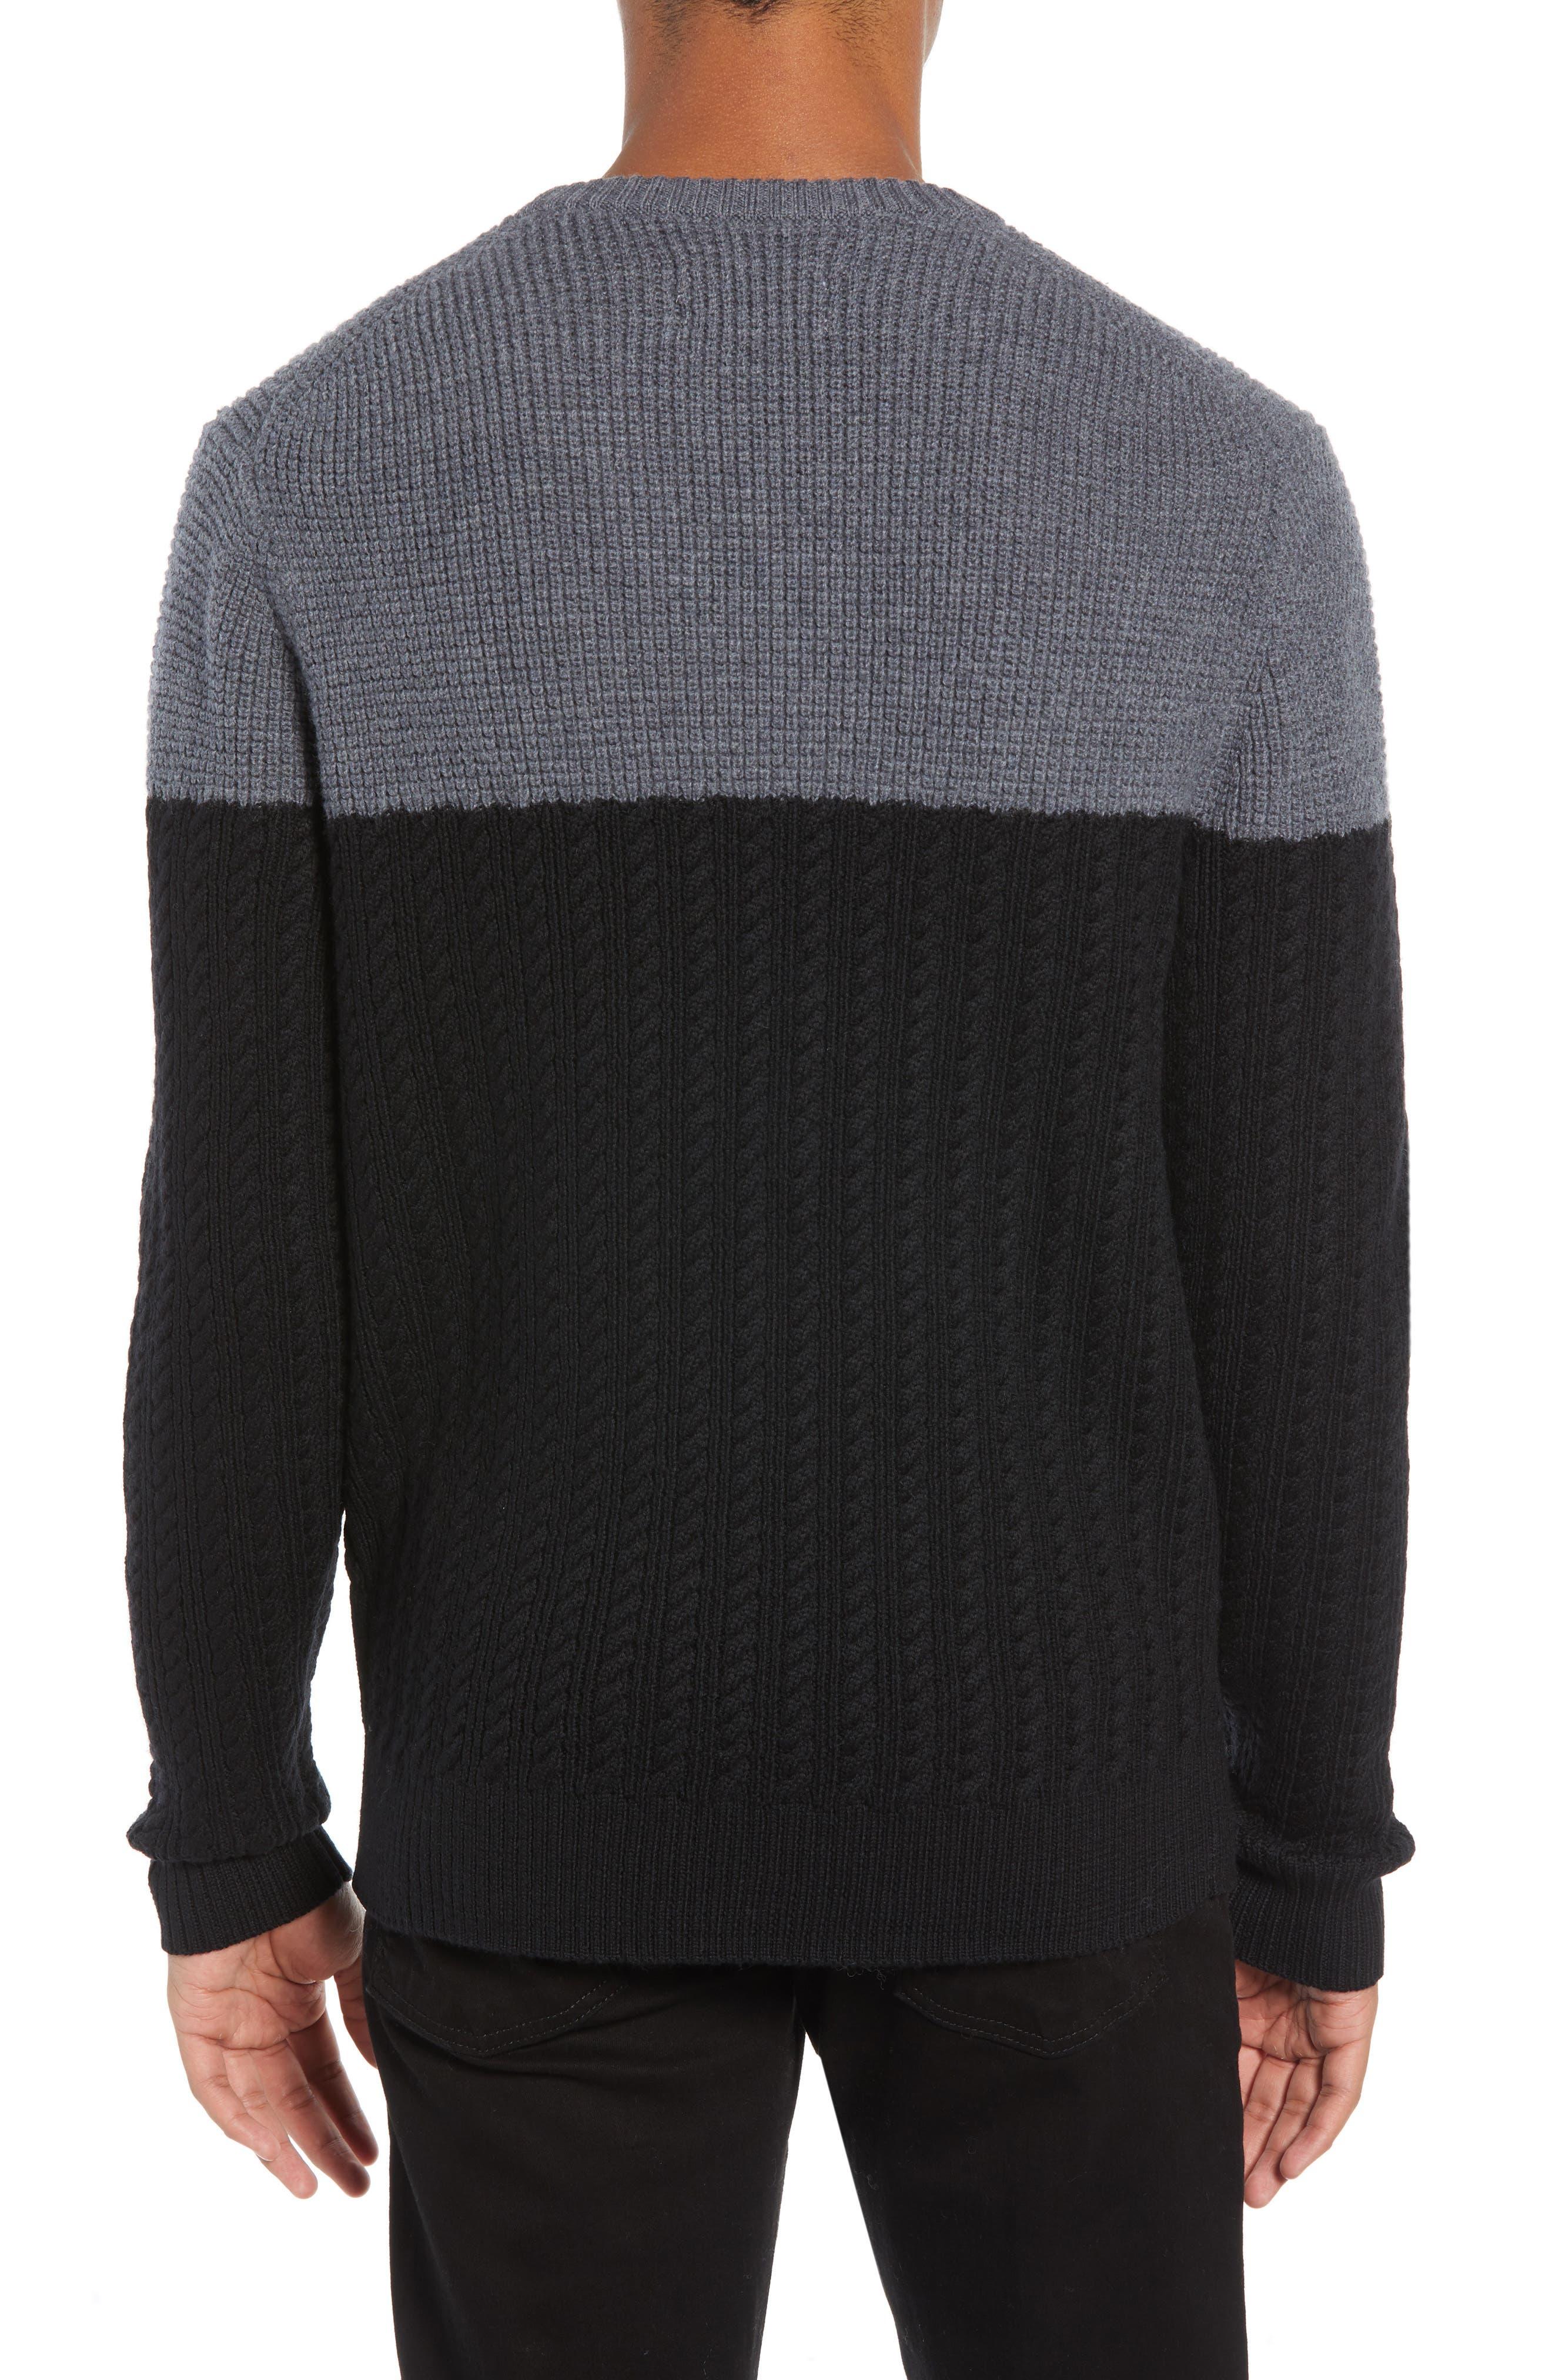 Block Merino Wool Cable Knit Sweater,                             Alternate thumbnail 2, color,                             BLACK CAVIAR COLORBLOCK